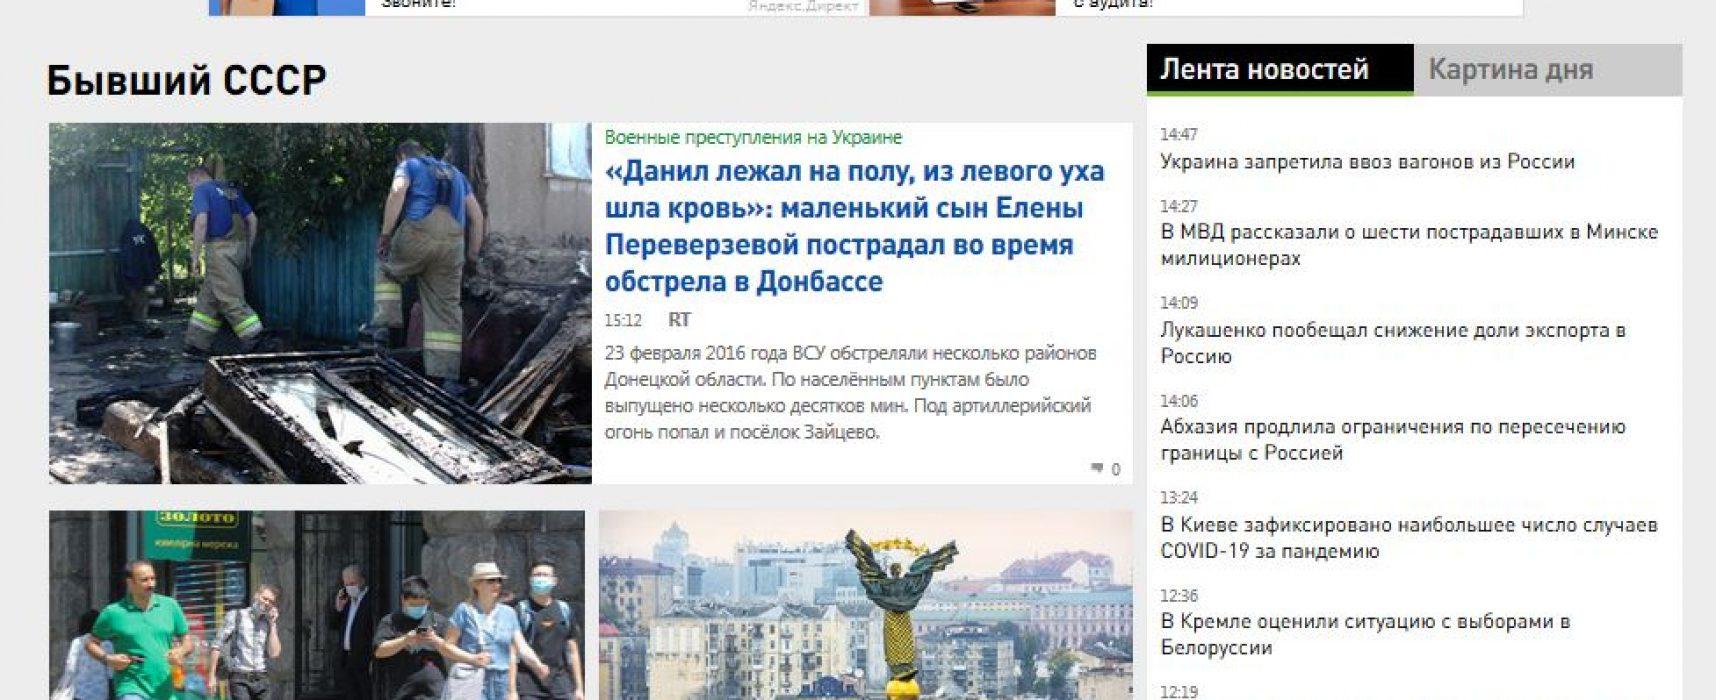 Беларуская аудитория RT.com